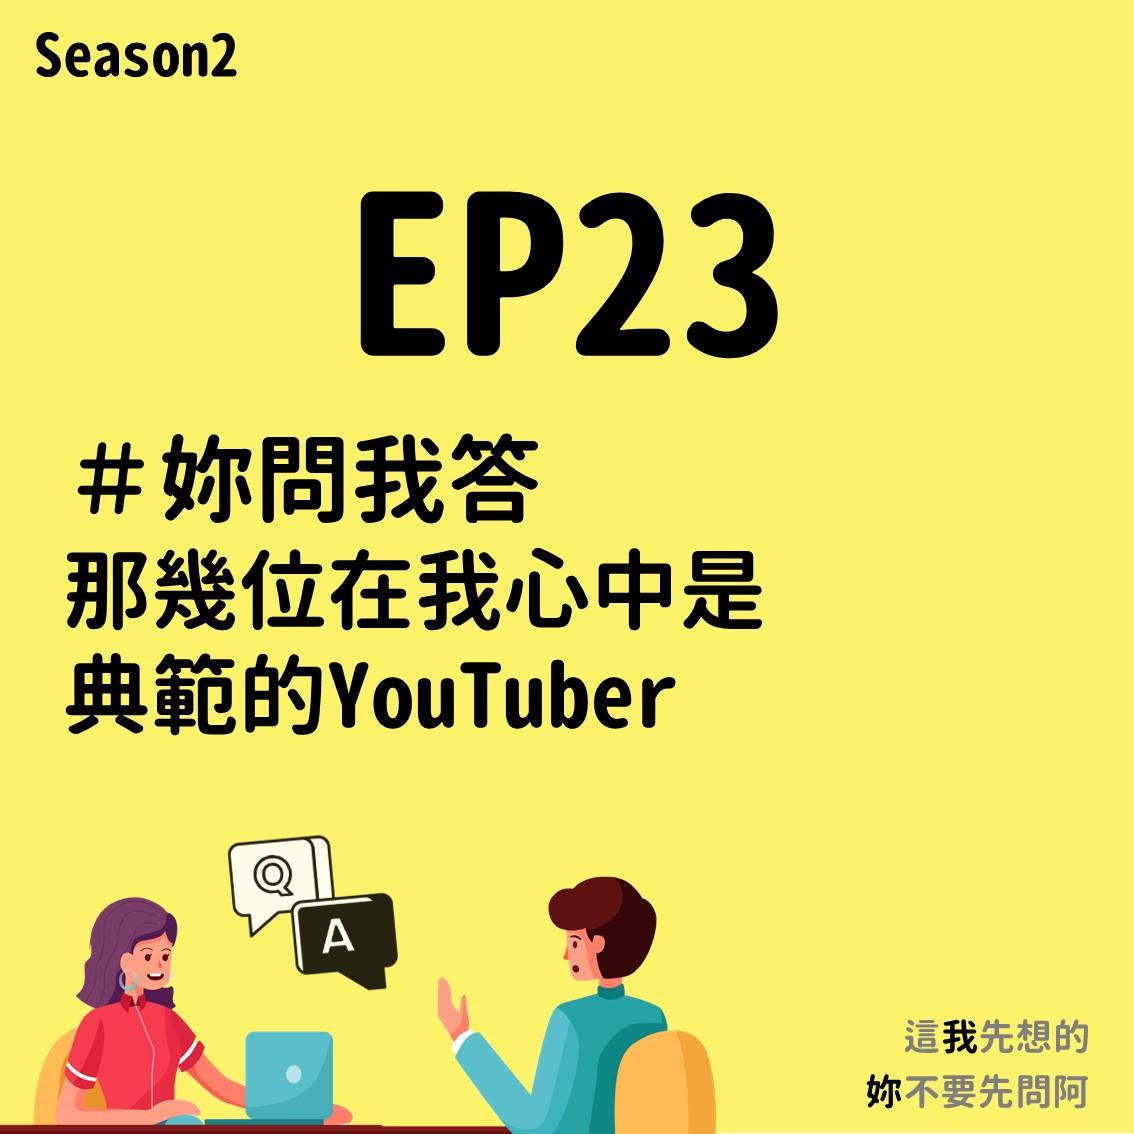 EP23 妳問我答 那幾位在我心中是典範的YouTuber